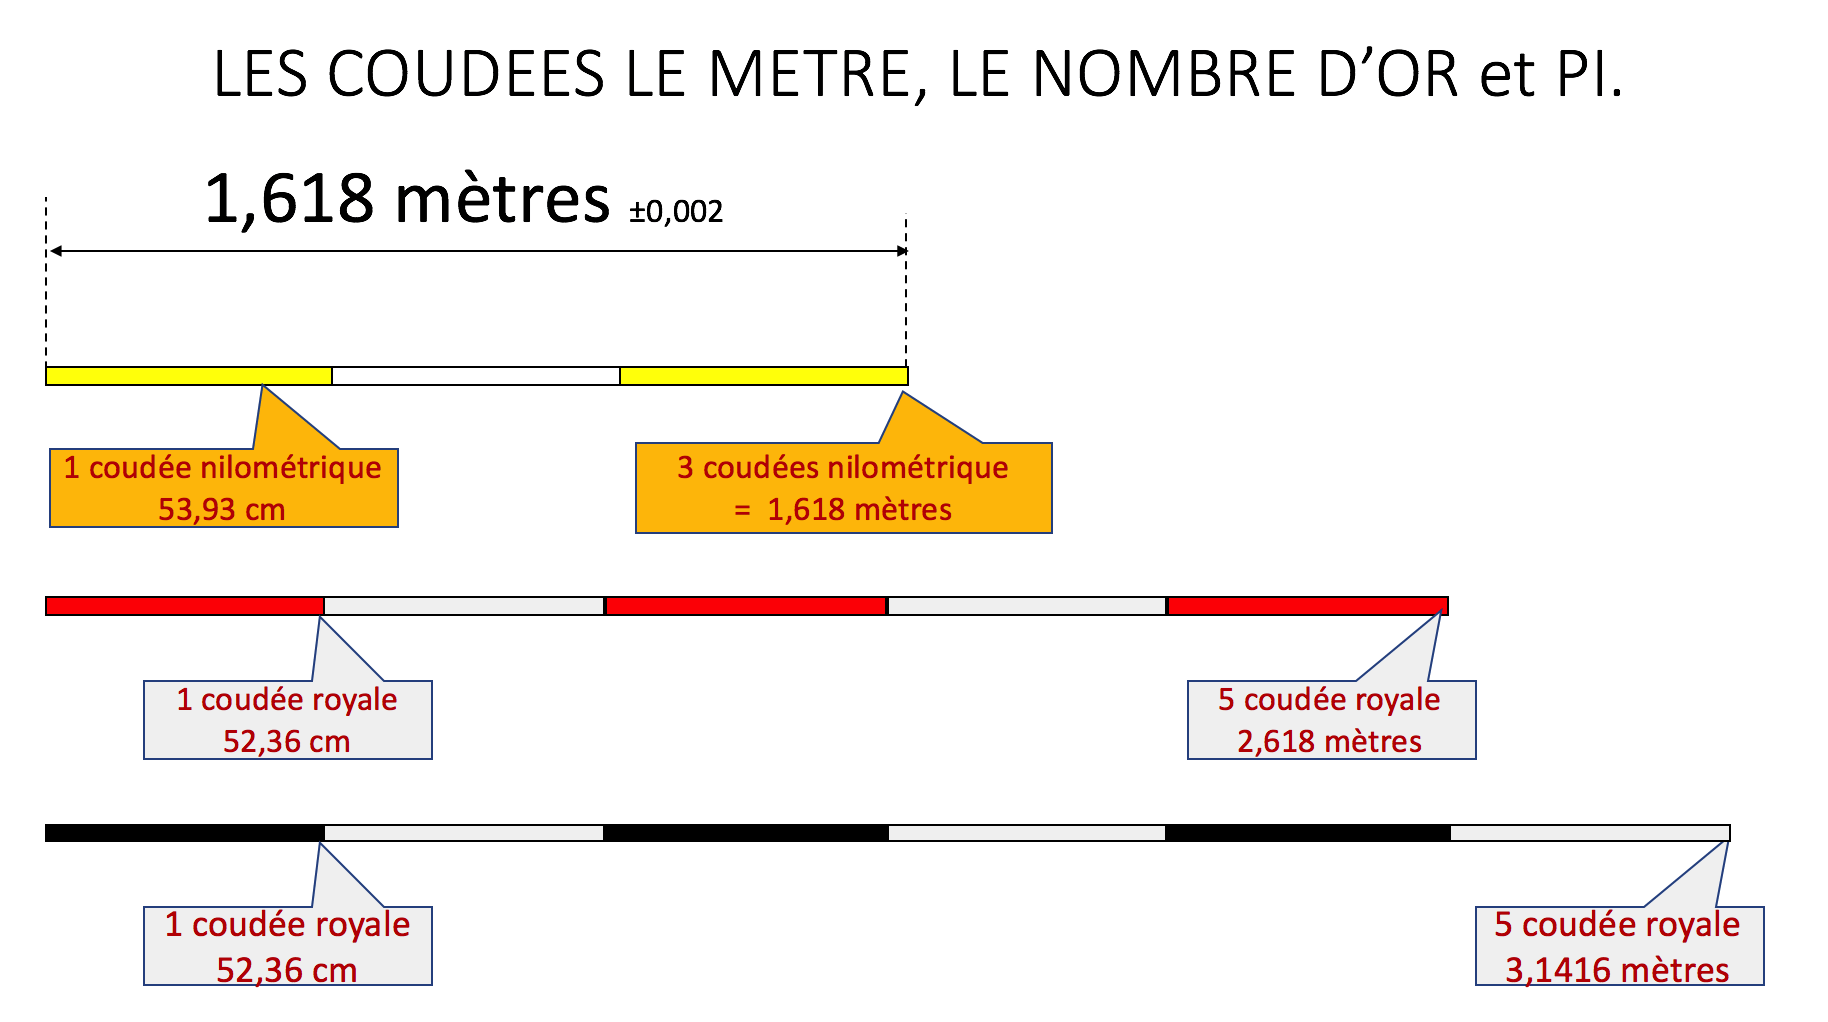 2017-10-18 22:37:51